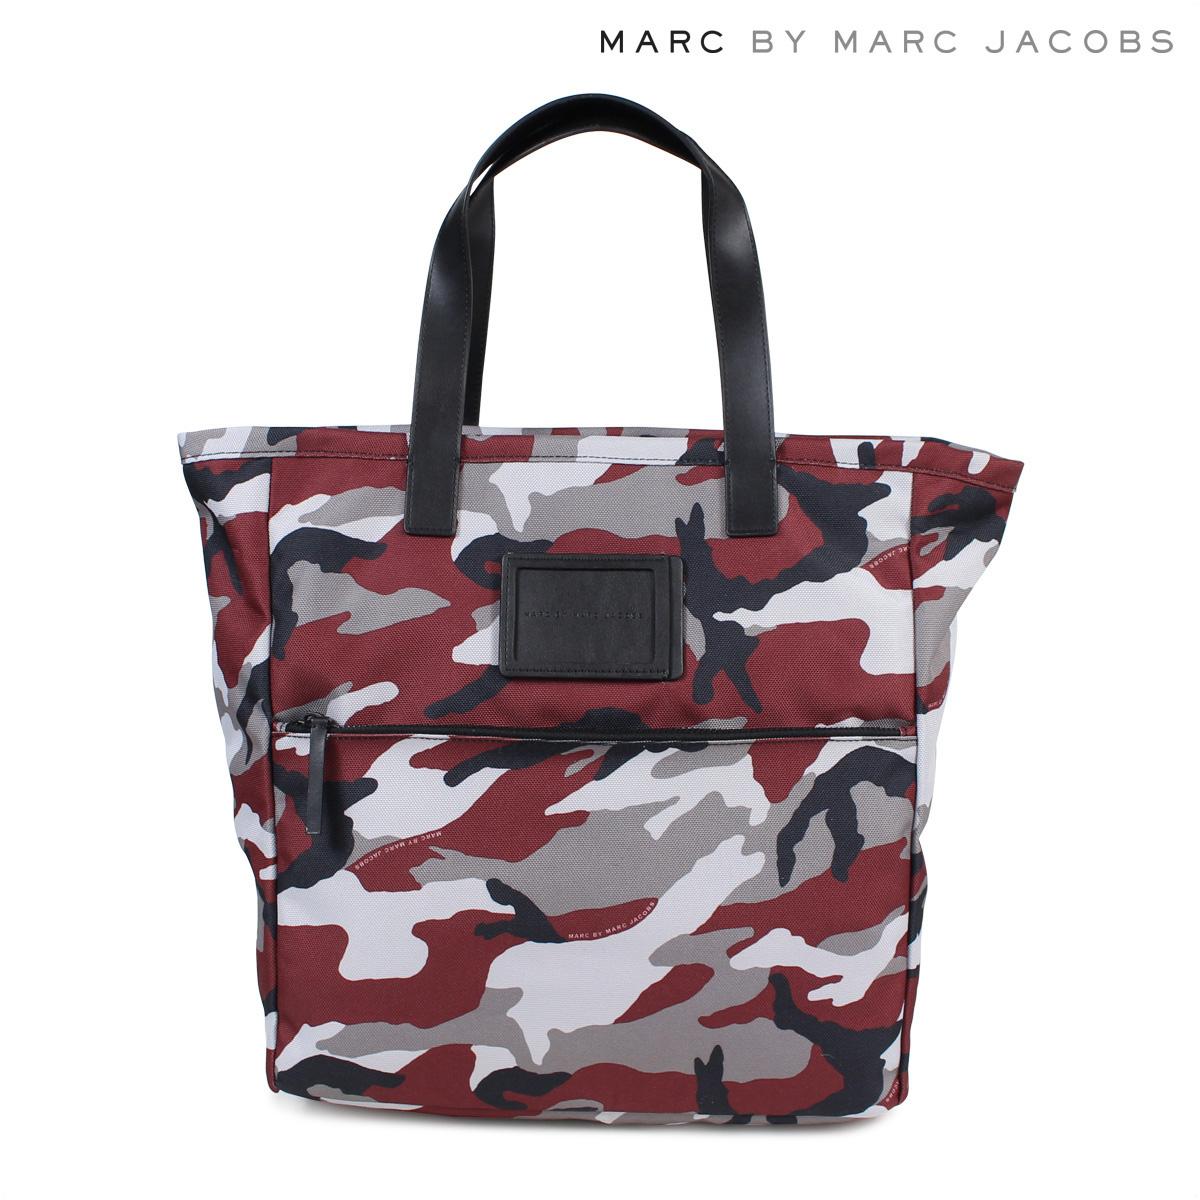 MARC BY MARC JACOBS マークバイマークジェイコブス バッグ トートバッグ レディース CAMO NYLON TOTE ワインレッド 赤 M0003918